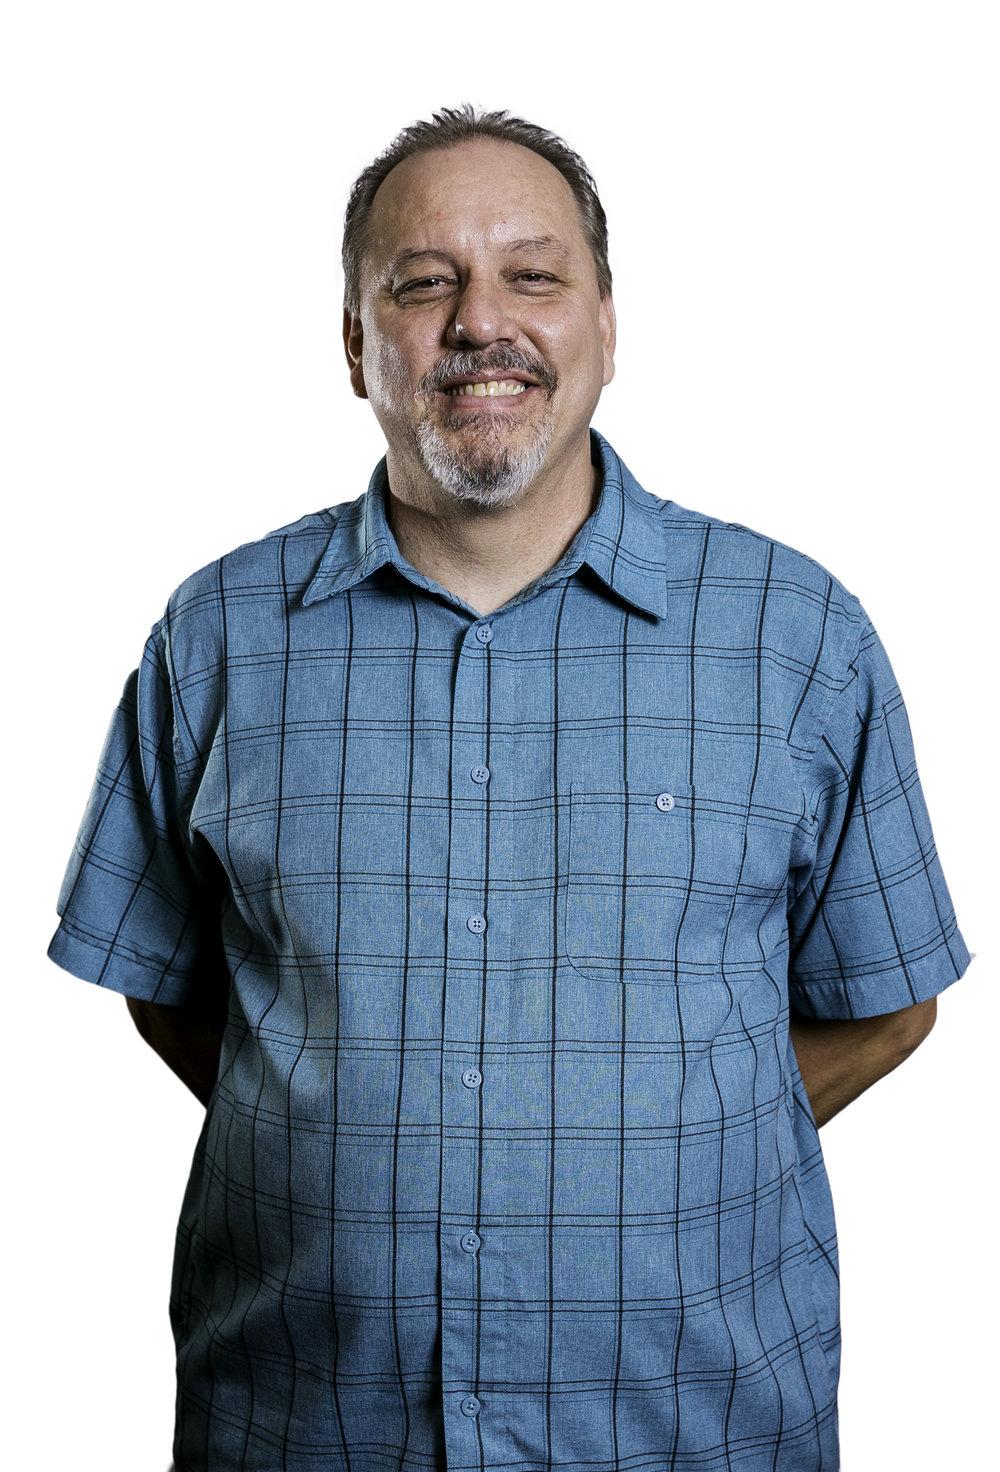 Jeff Mullenax